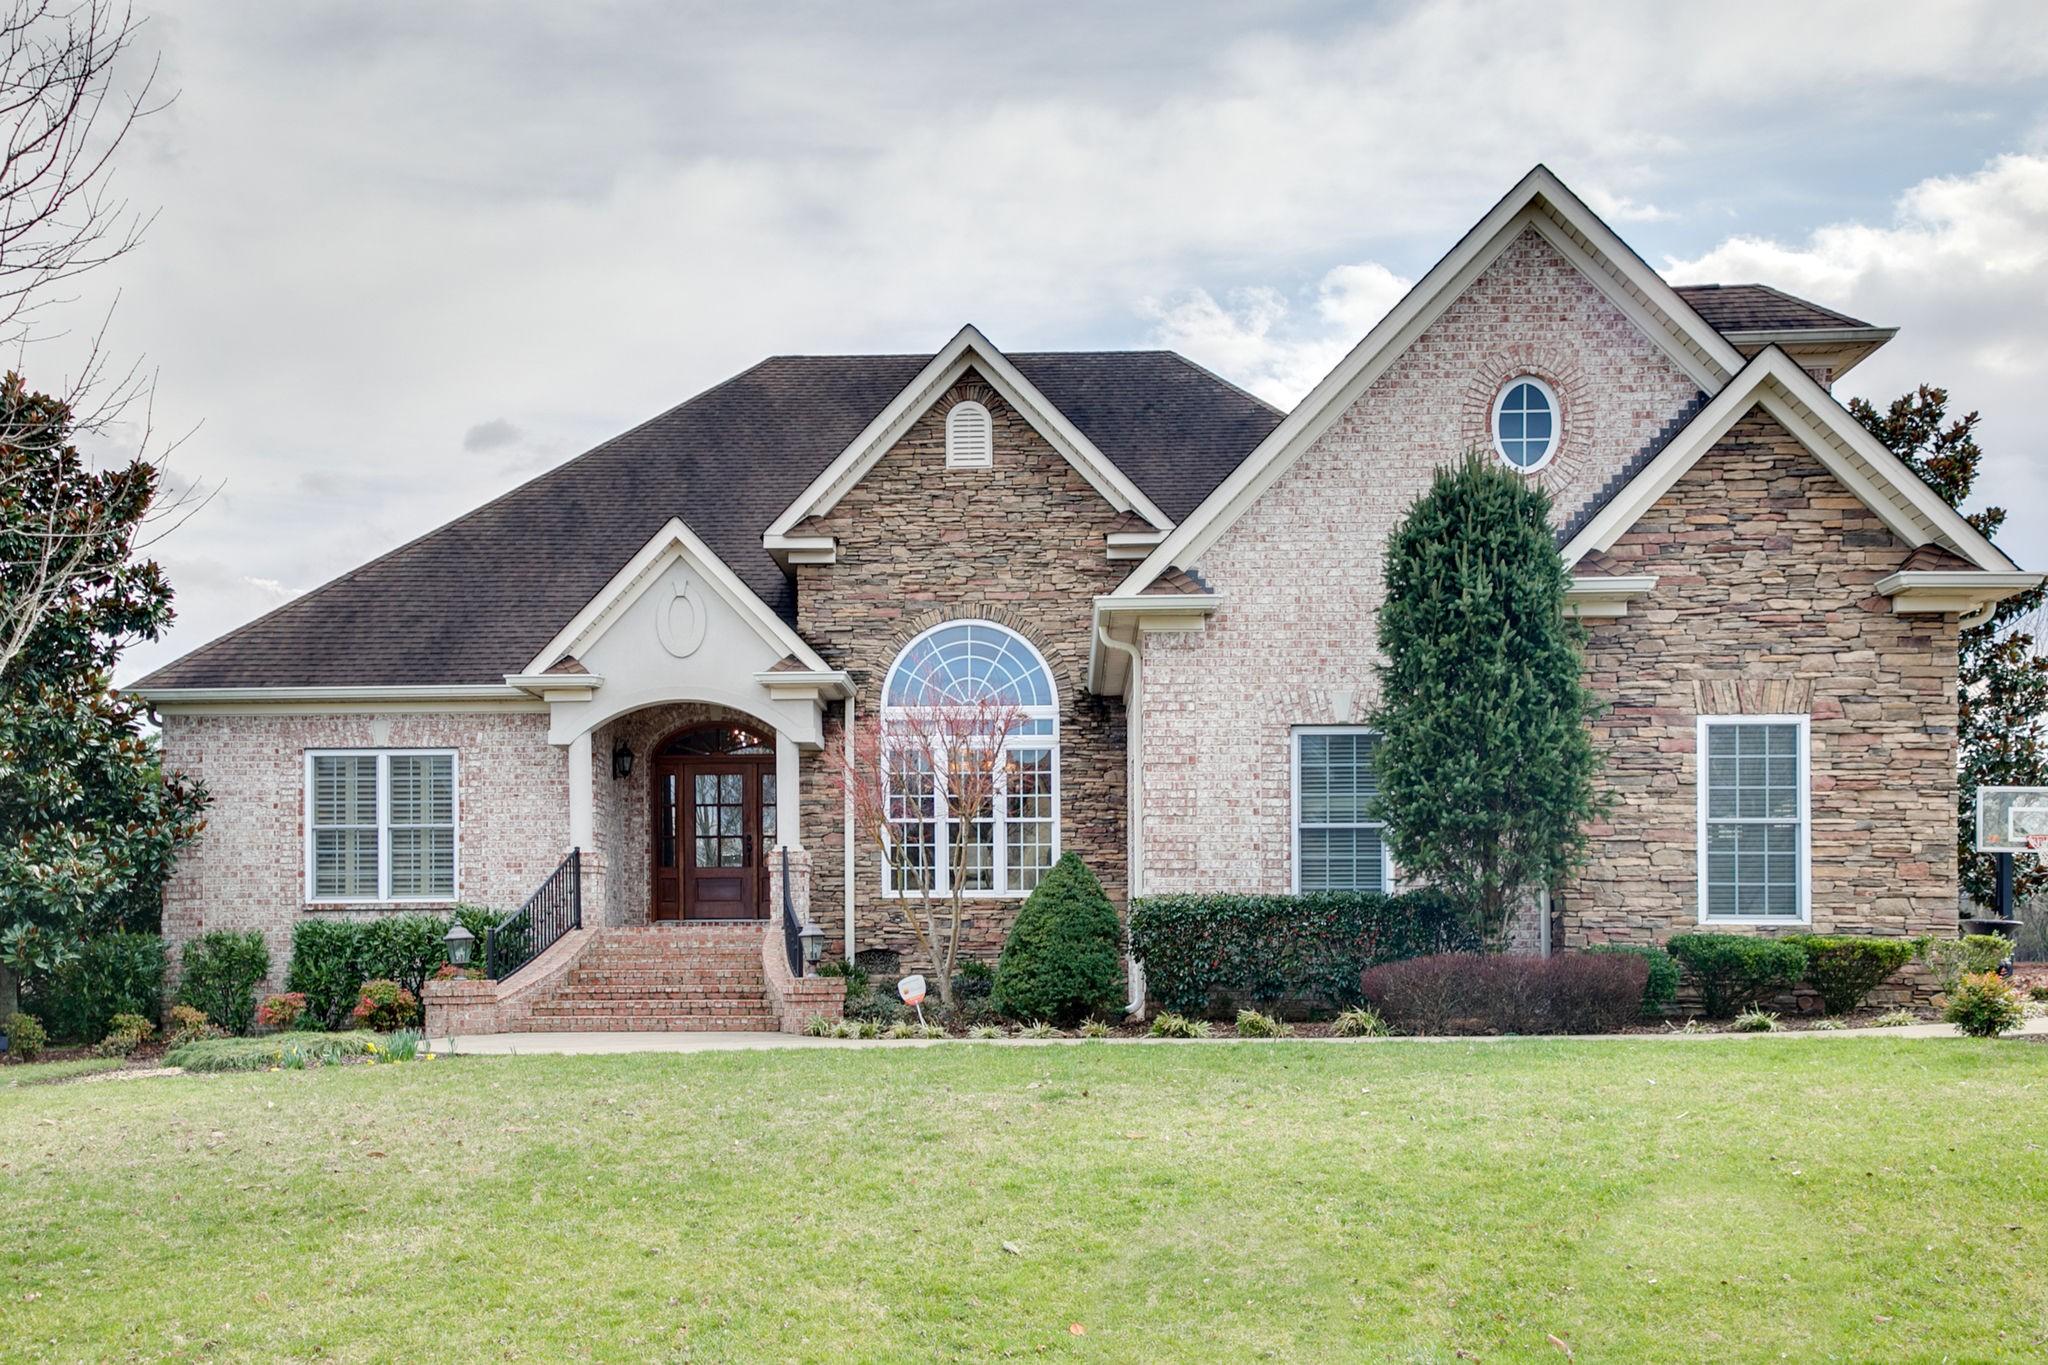 604 Gardenia Way, Murfreesboro, TN 37130 - Murfreesboro, TN real estate listing